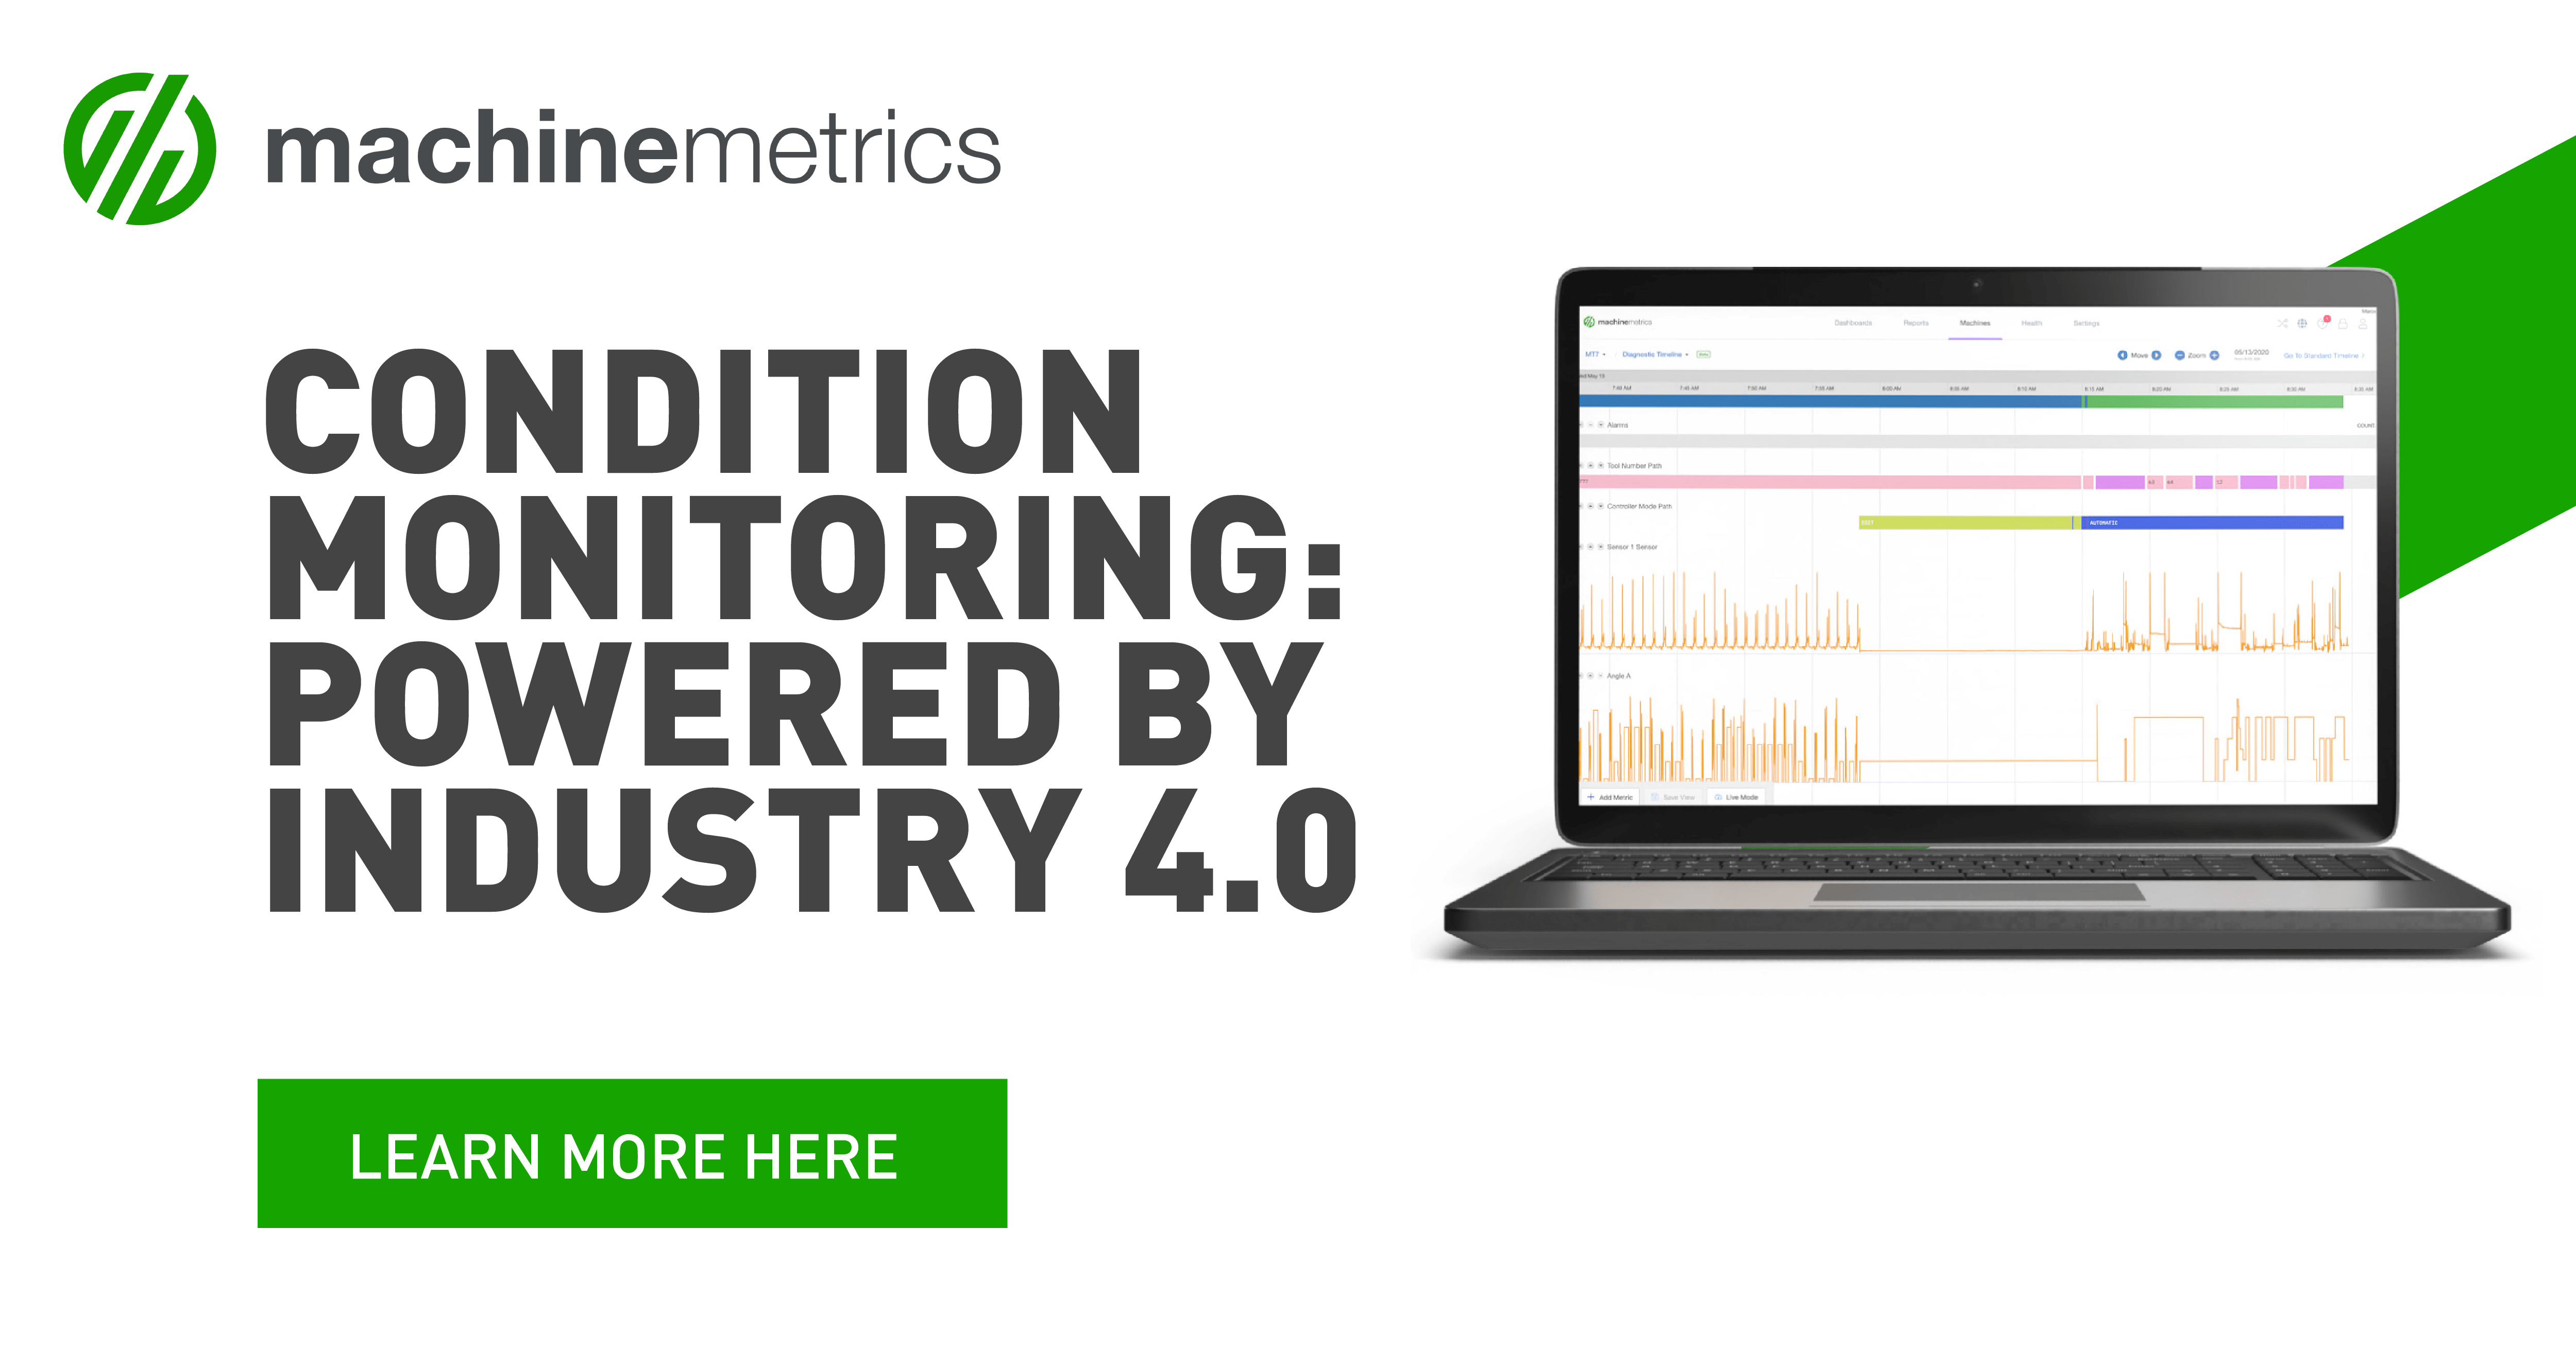 MachineMetrics Condition Monitoring